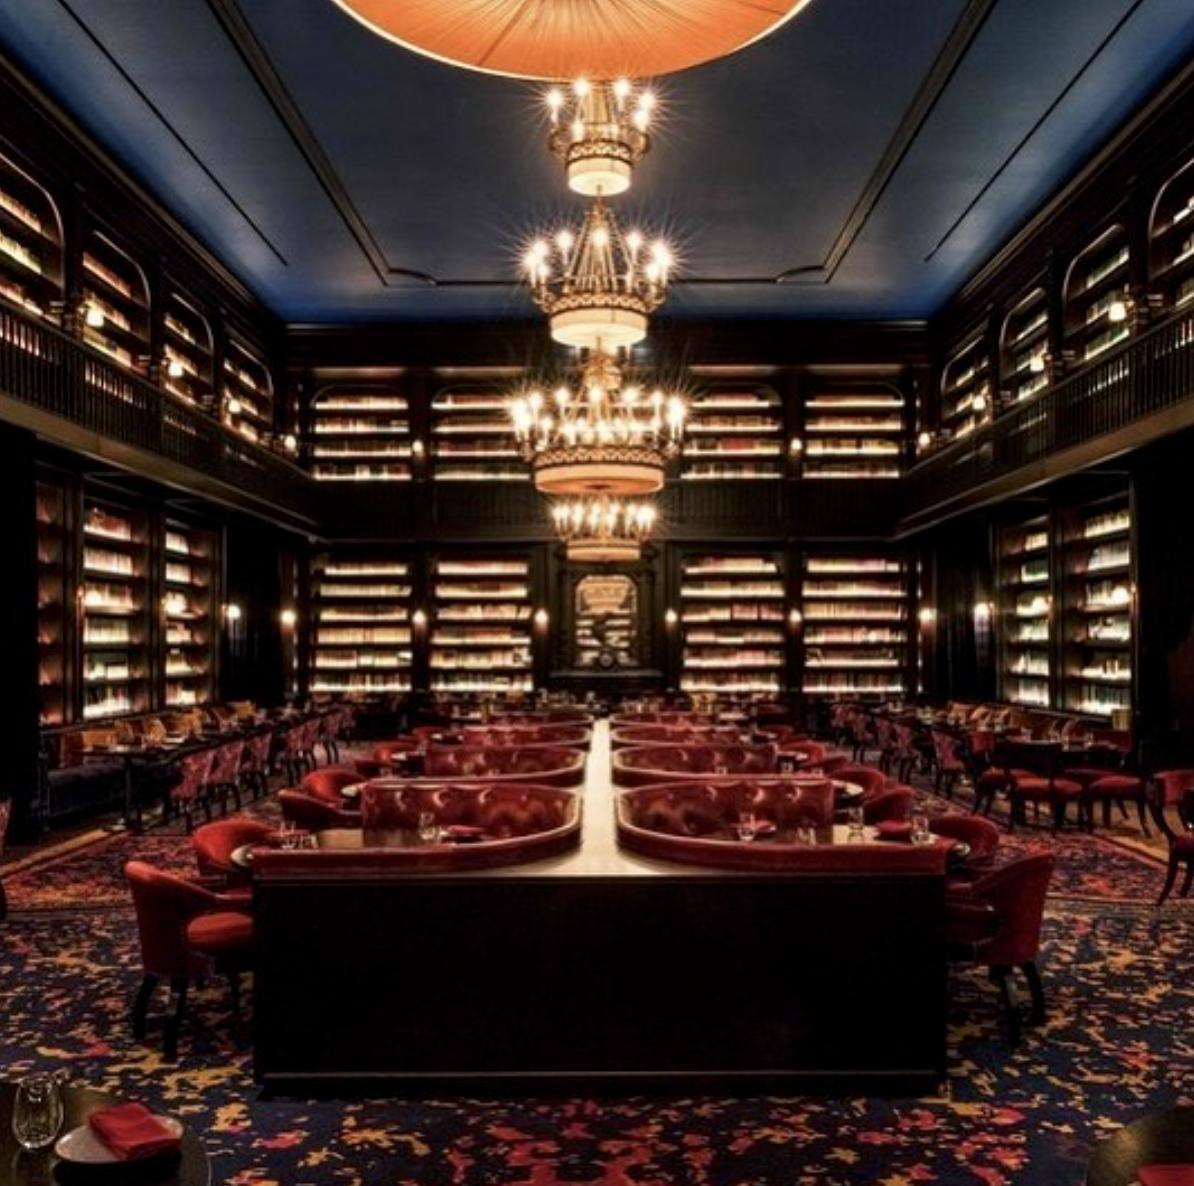 Nomad Hotel @MGM